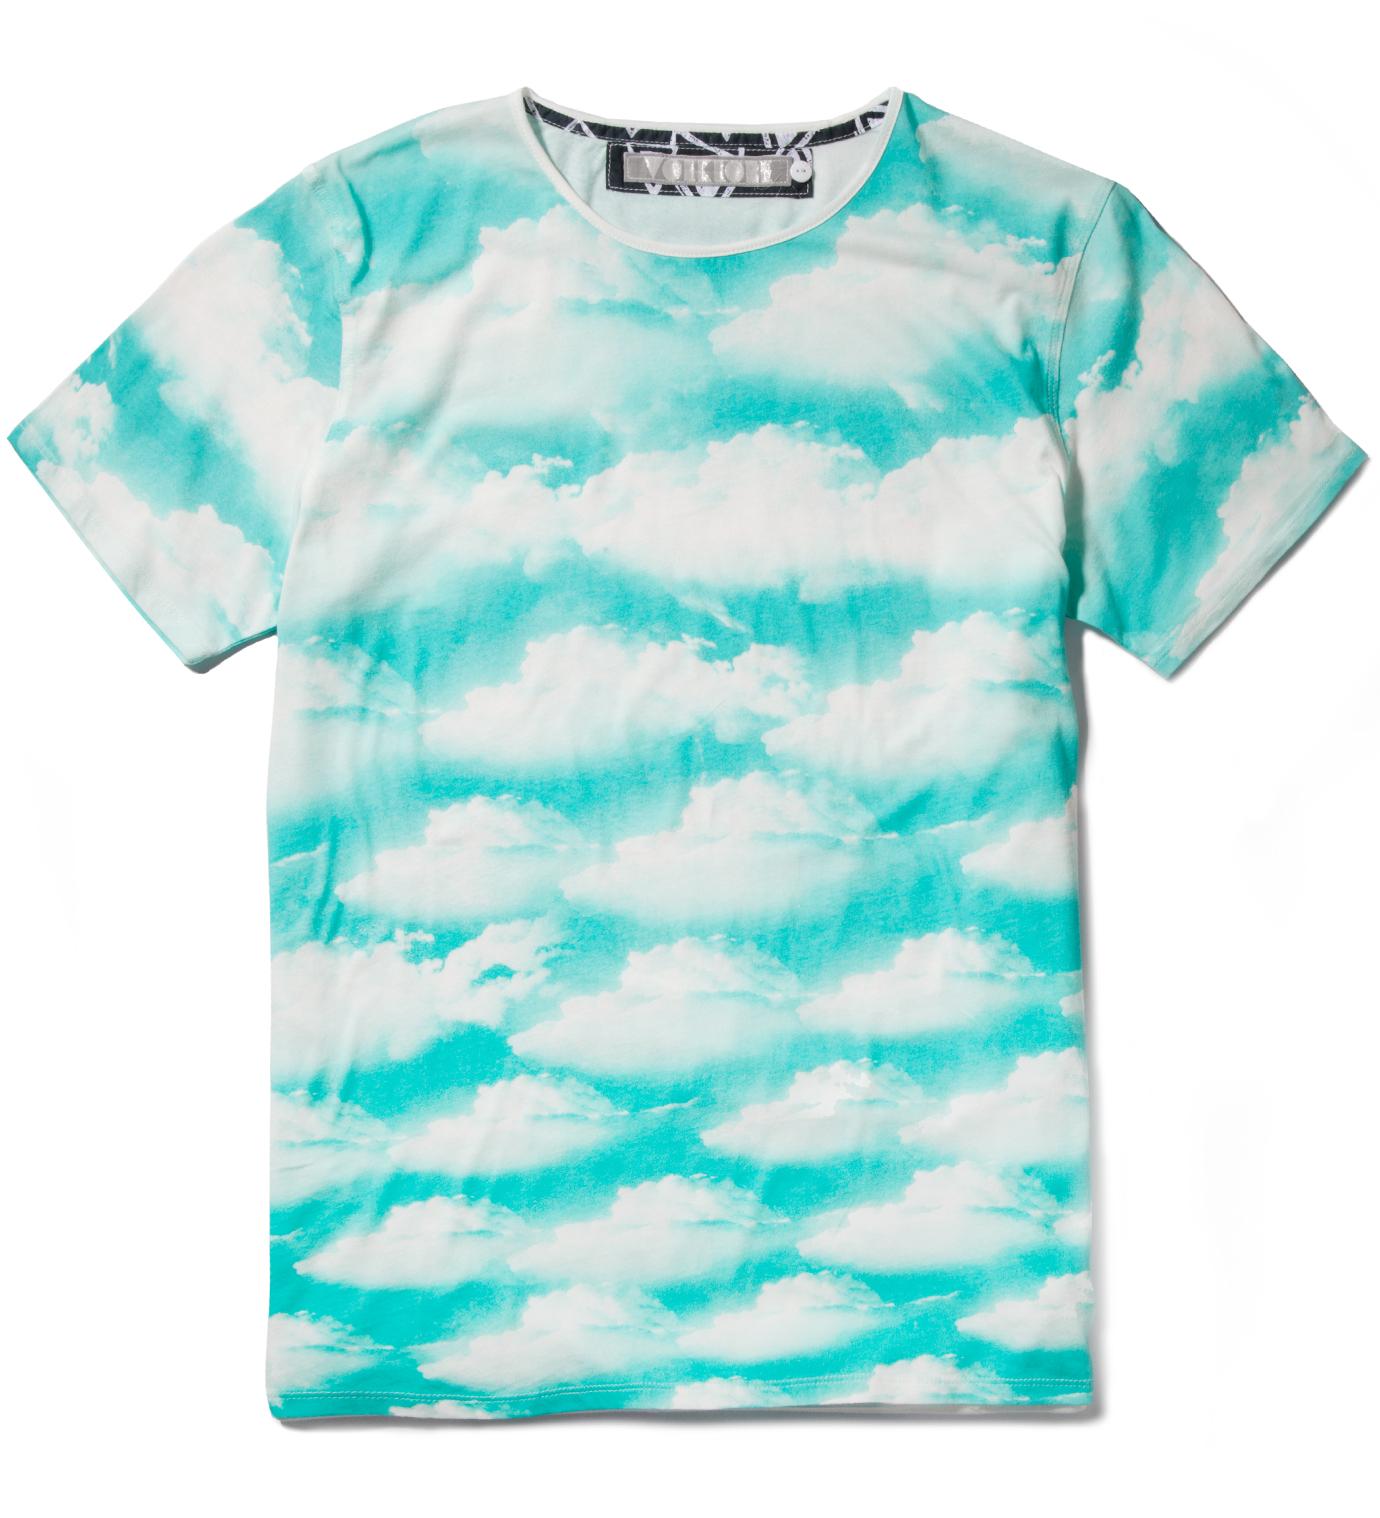 Volklore White Orbit T-Shirt